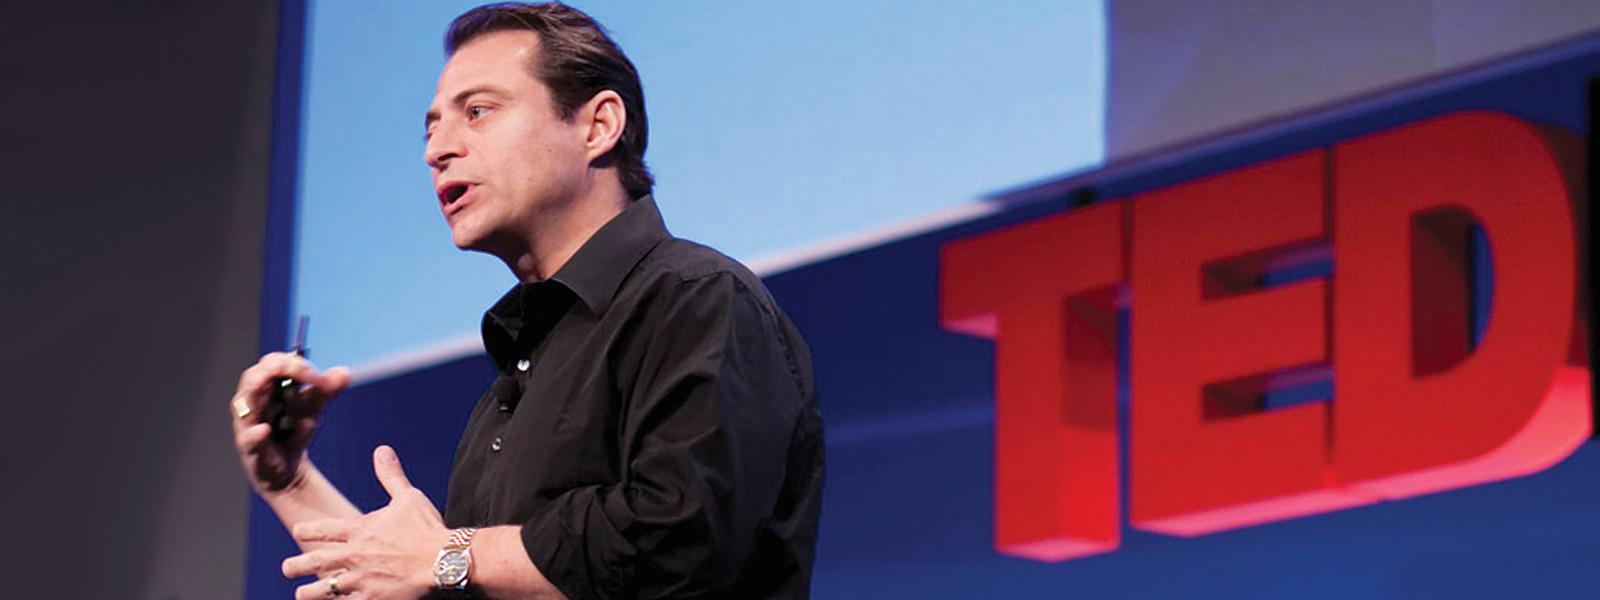 Ted Talk: Peter Diamandis- Abundance is Our Future